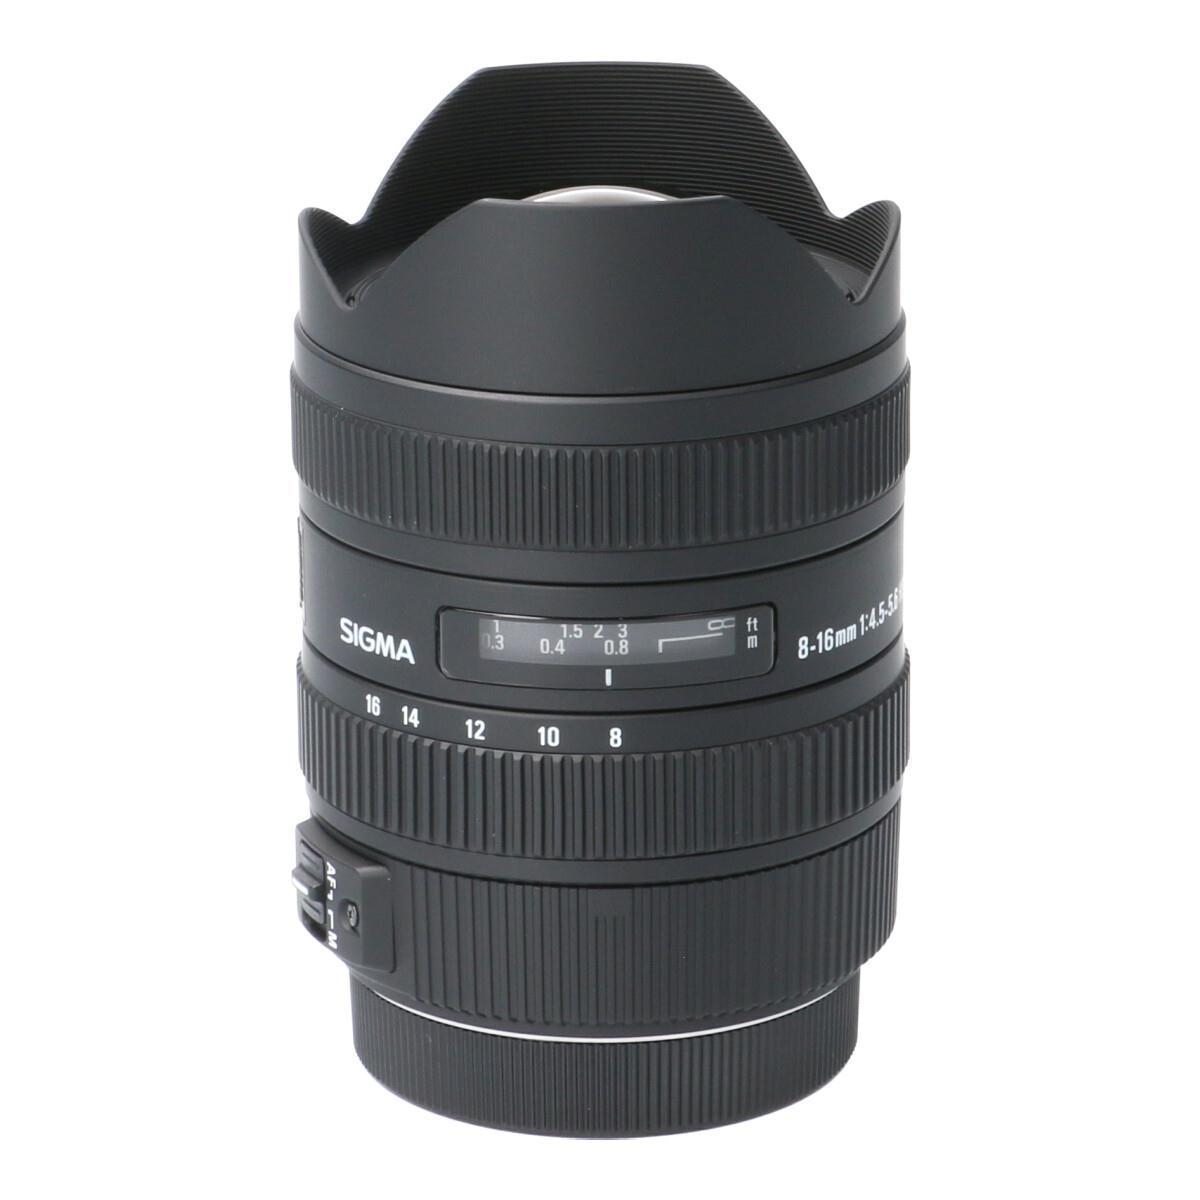 SIGMA EOS8-16mm F4.5-5.6DC HSM【中古】